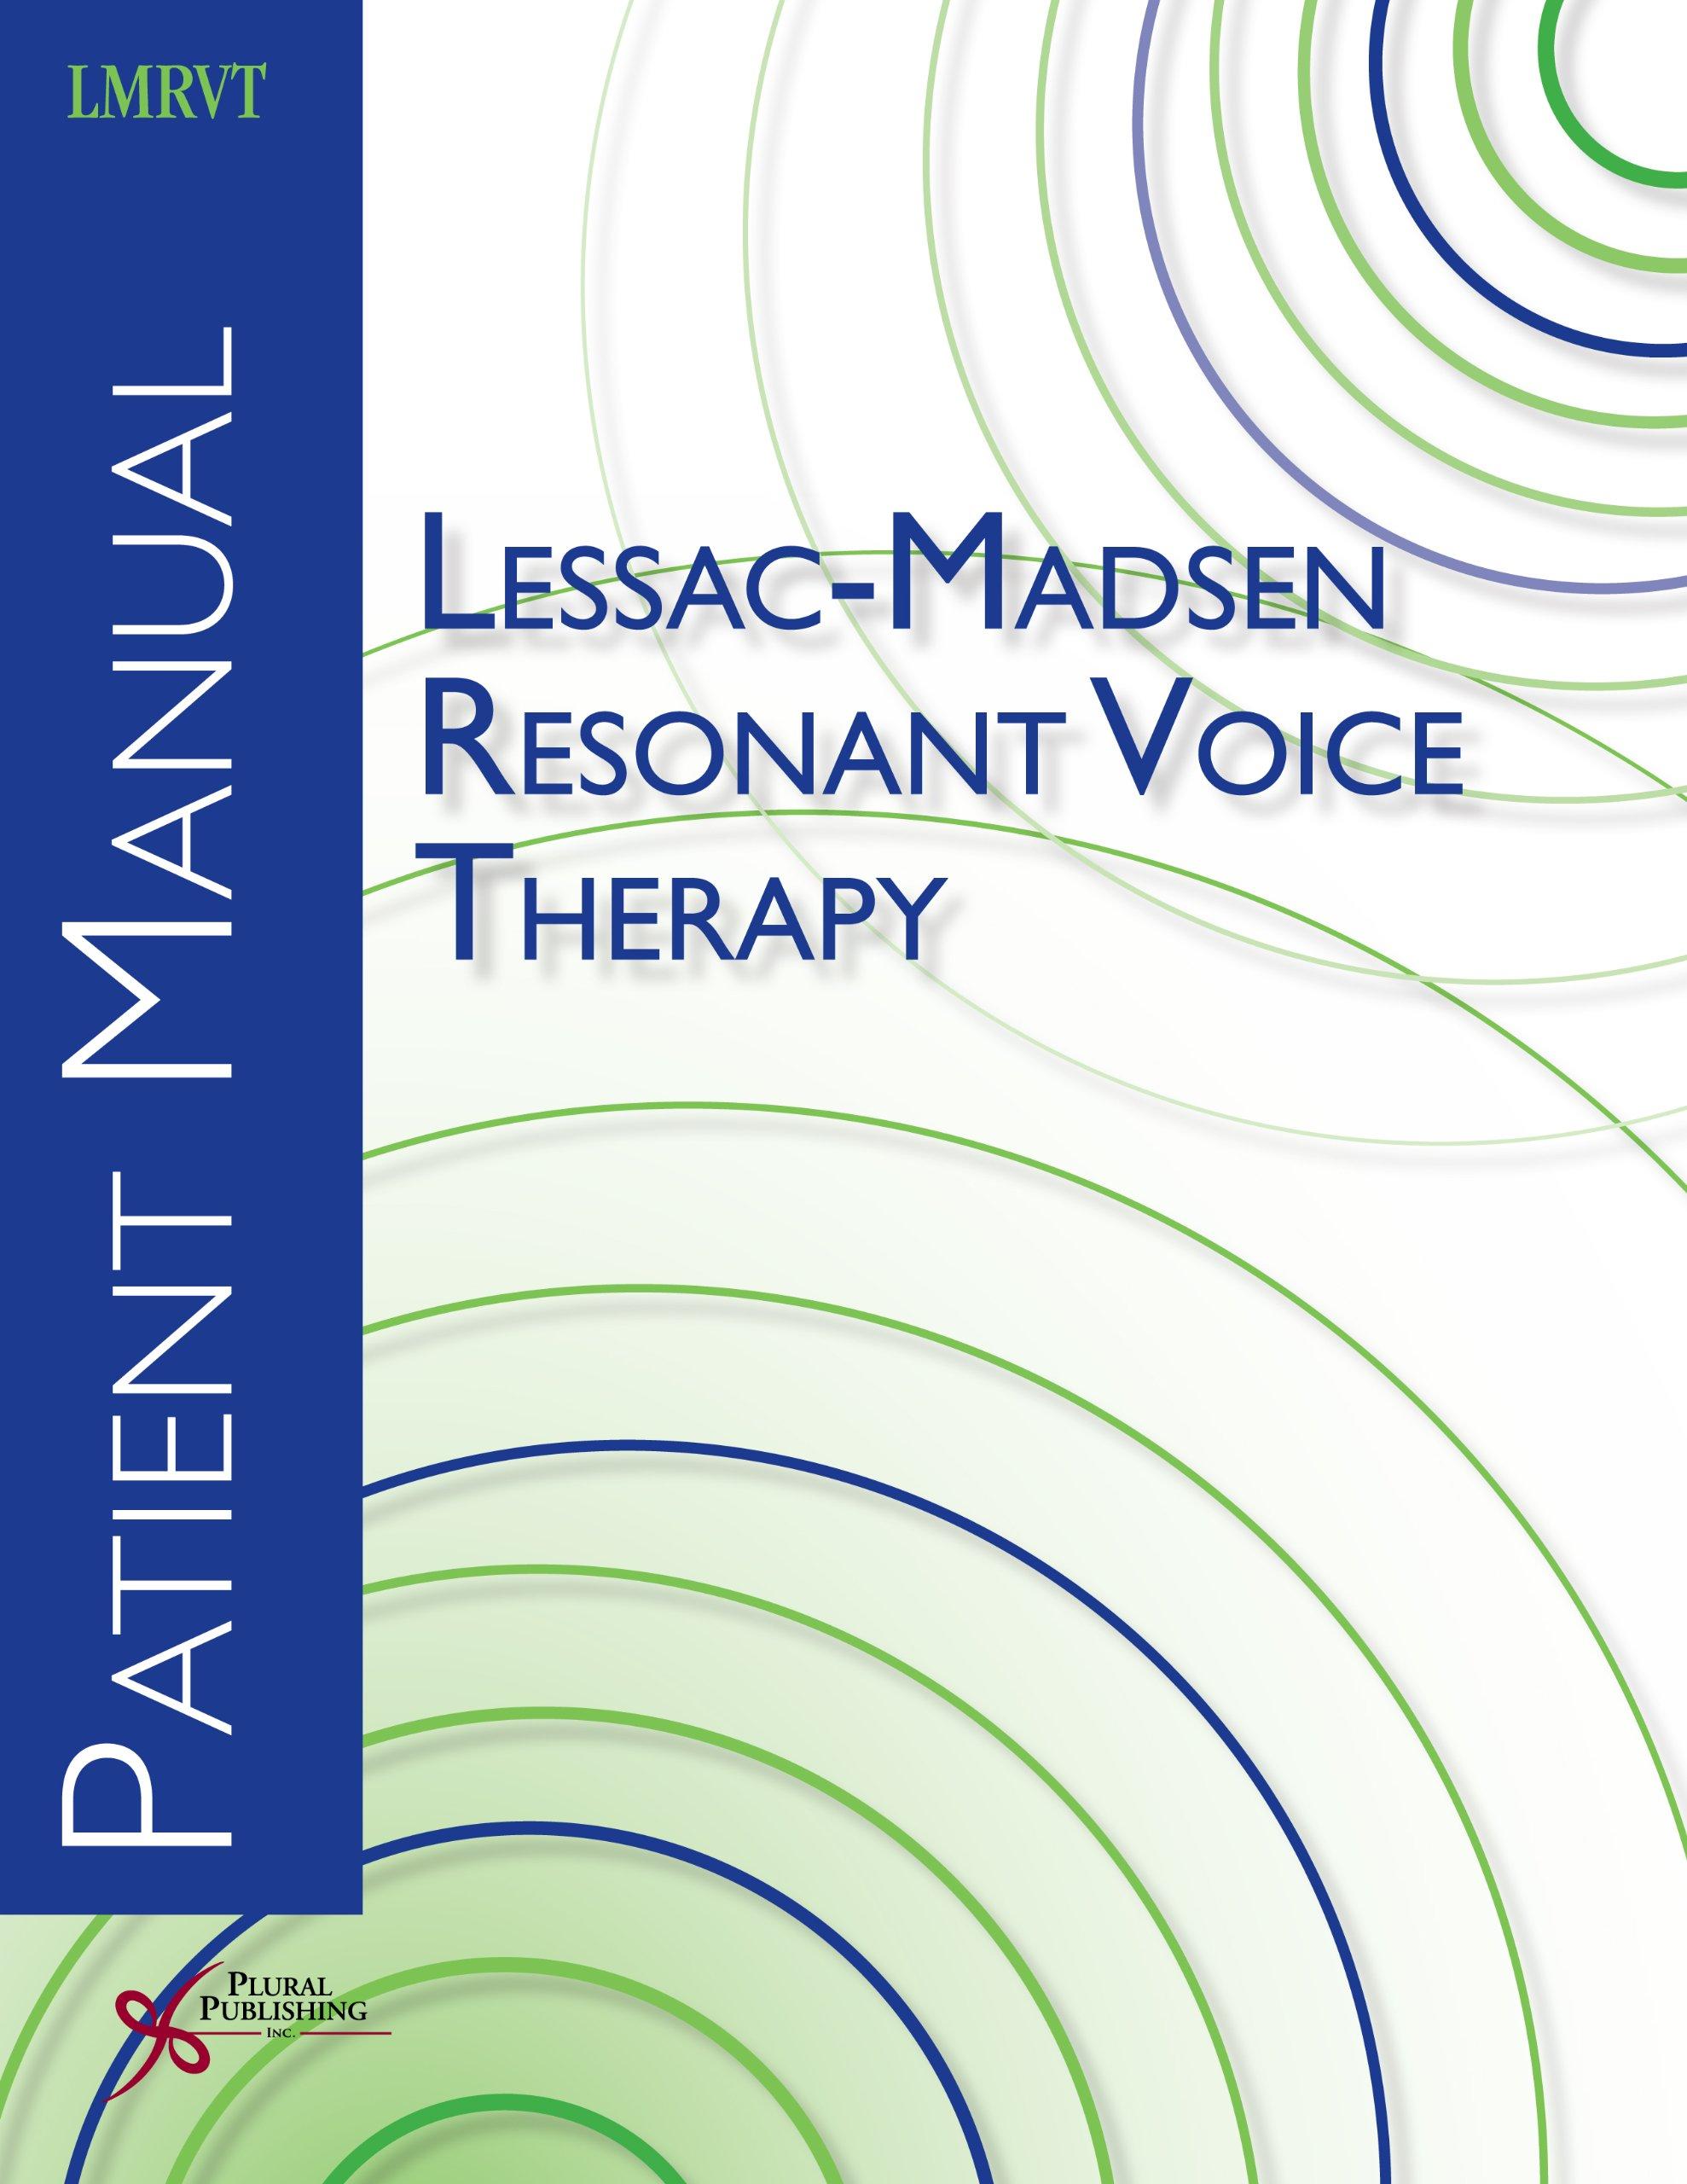 Lessac-Madsen Resonant Voice Therapy: Patient Manual: Katherine Verdolini  Abbott: 9781597563109: Books - Amazon.ca